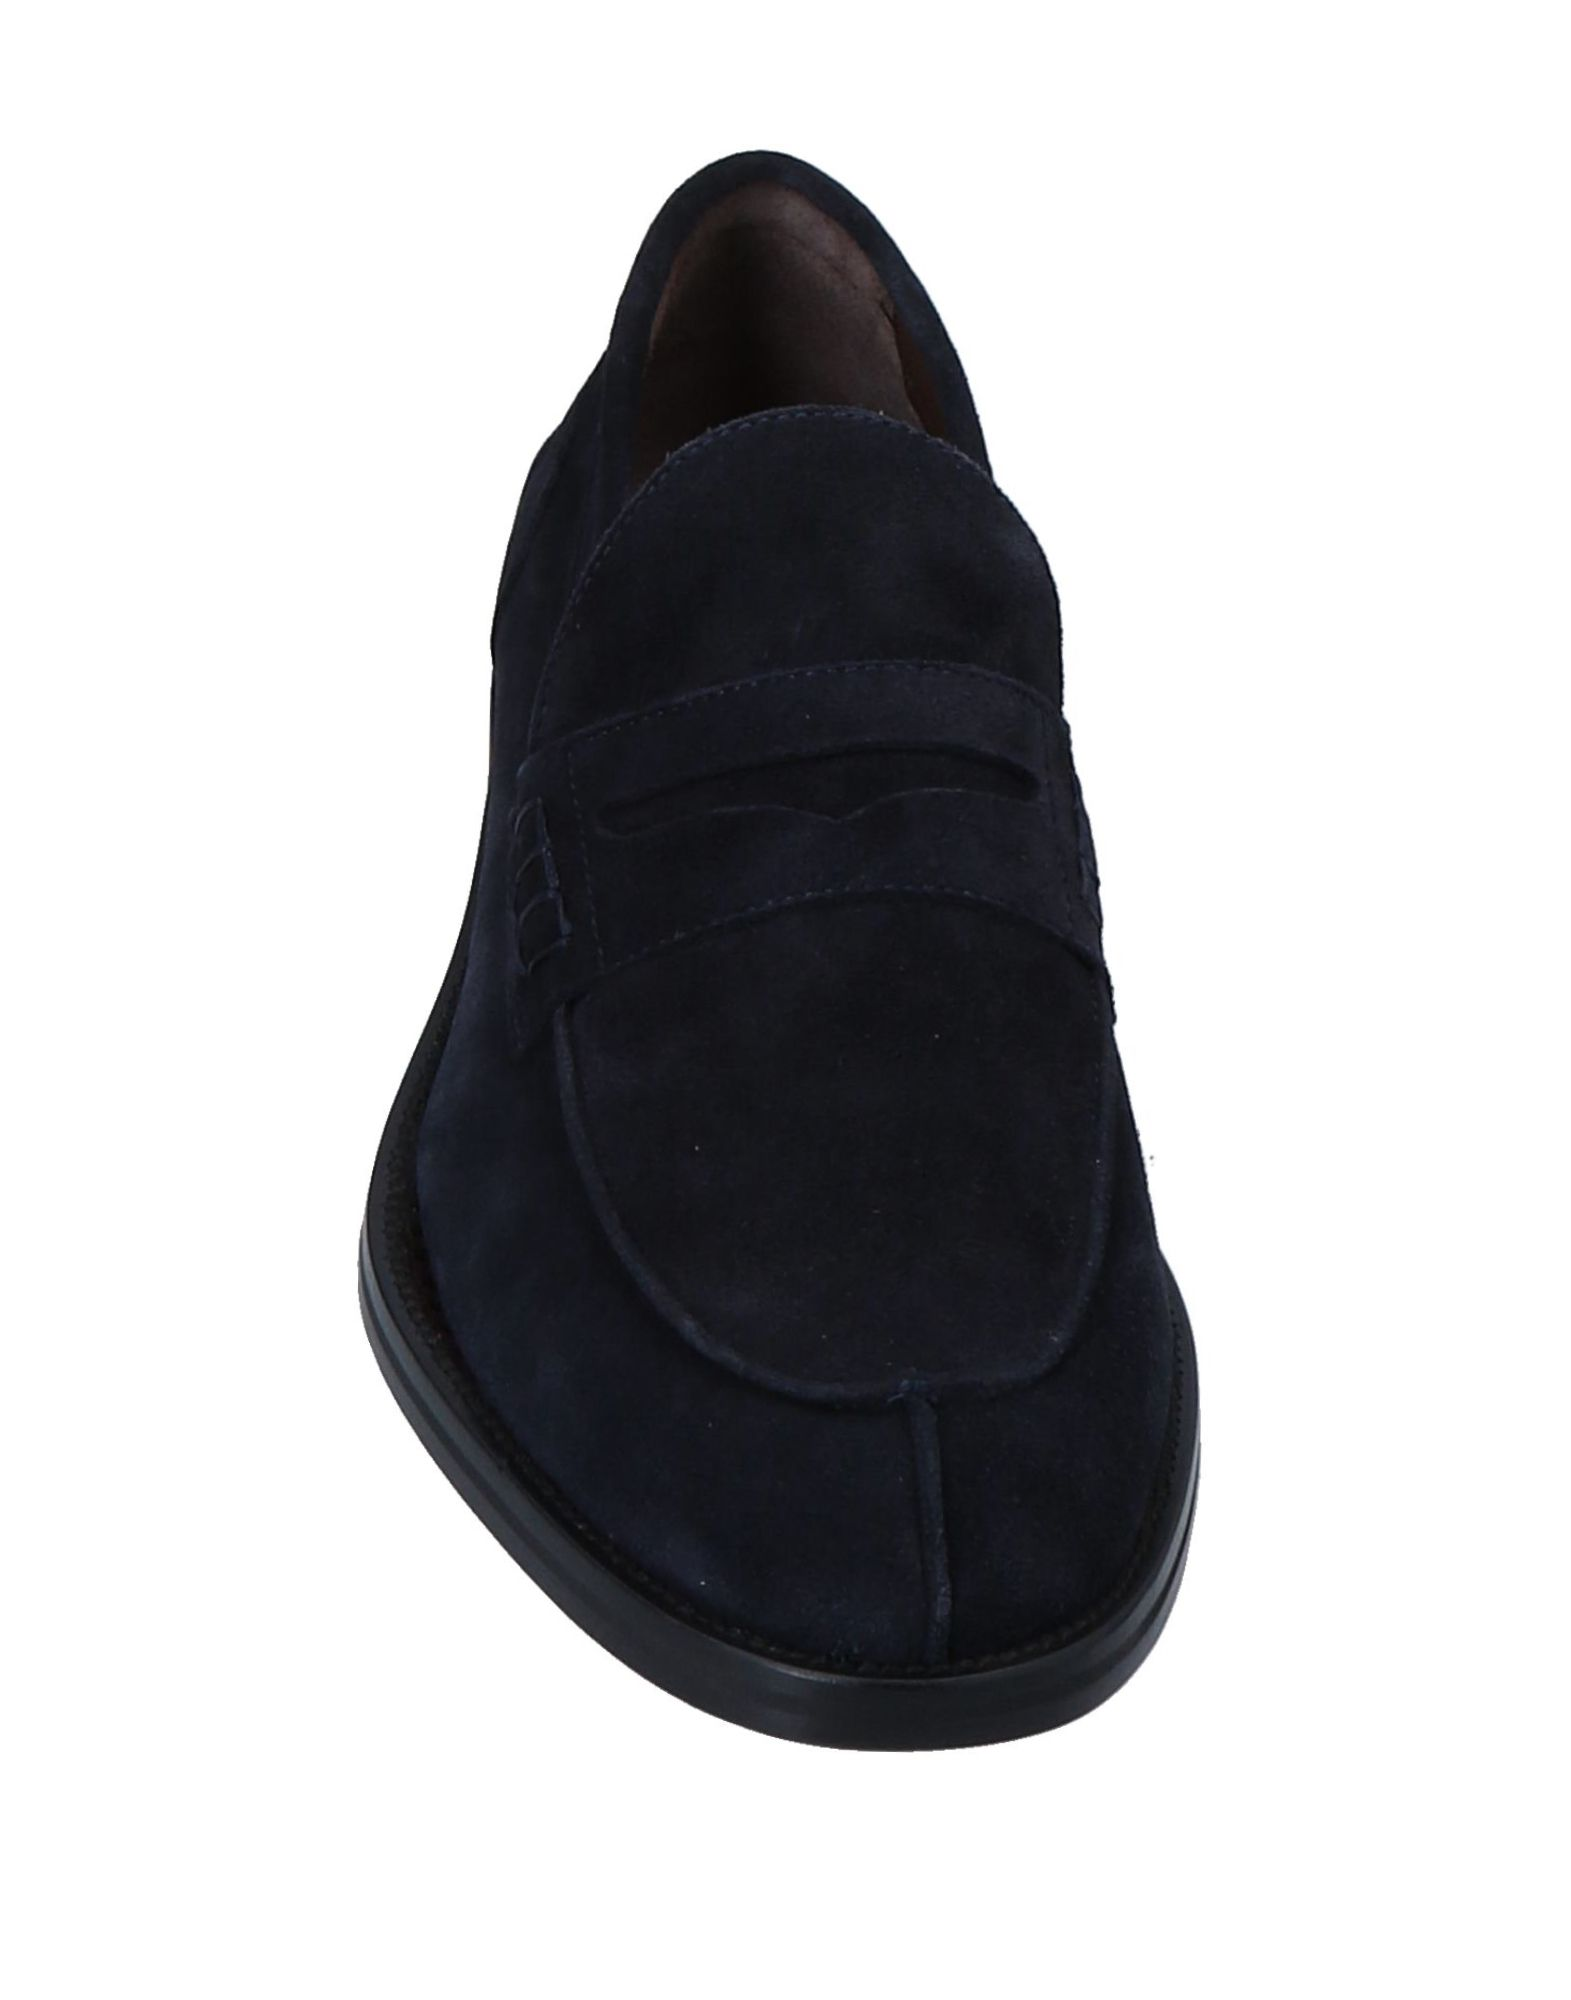 Rabatt echte  Schuhe Boemos Mokassins Herren  echte 11549980AC ff5b4b